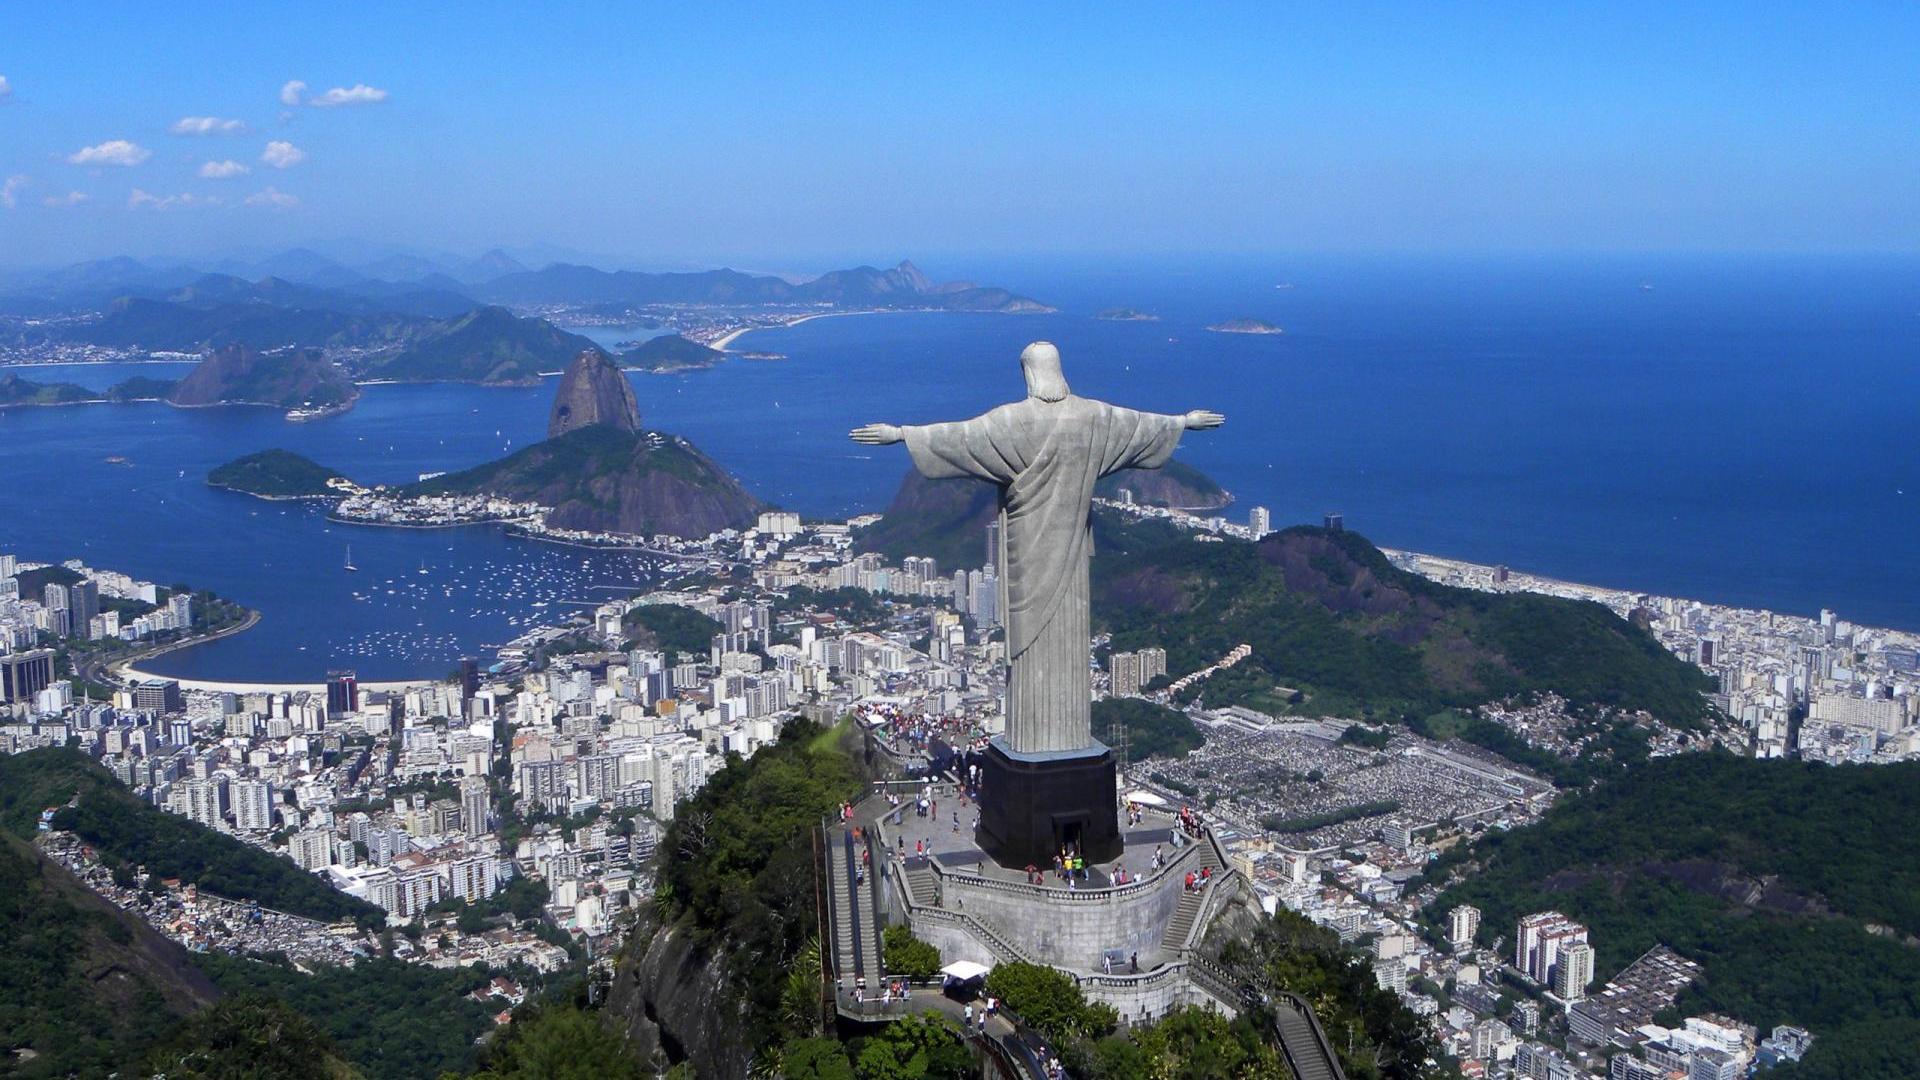 Rio de Janeiro background image Cities wallpapers 1920x1080